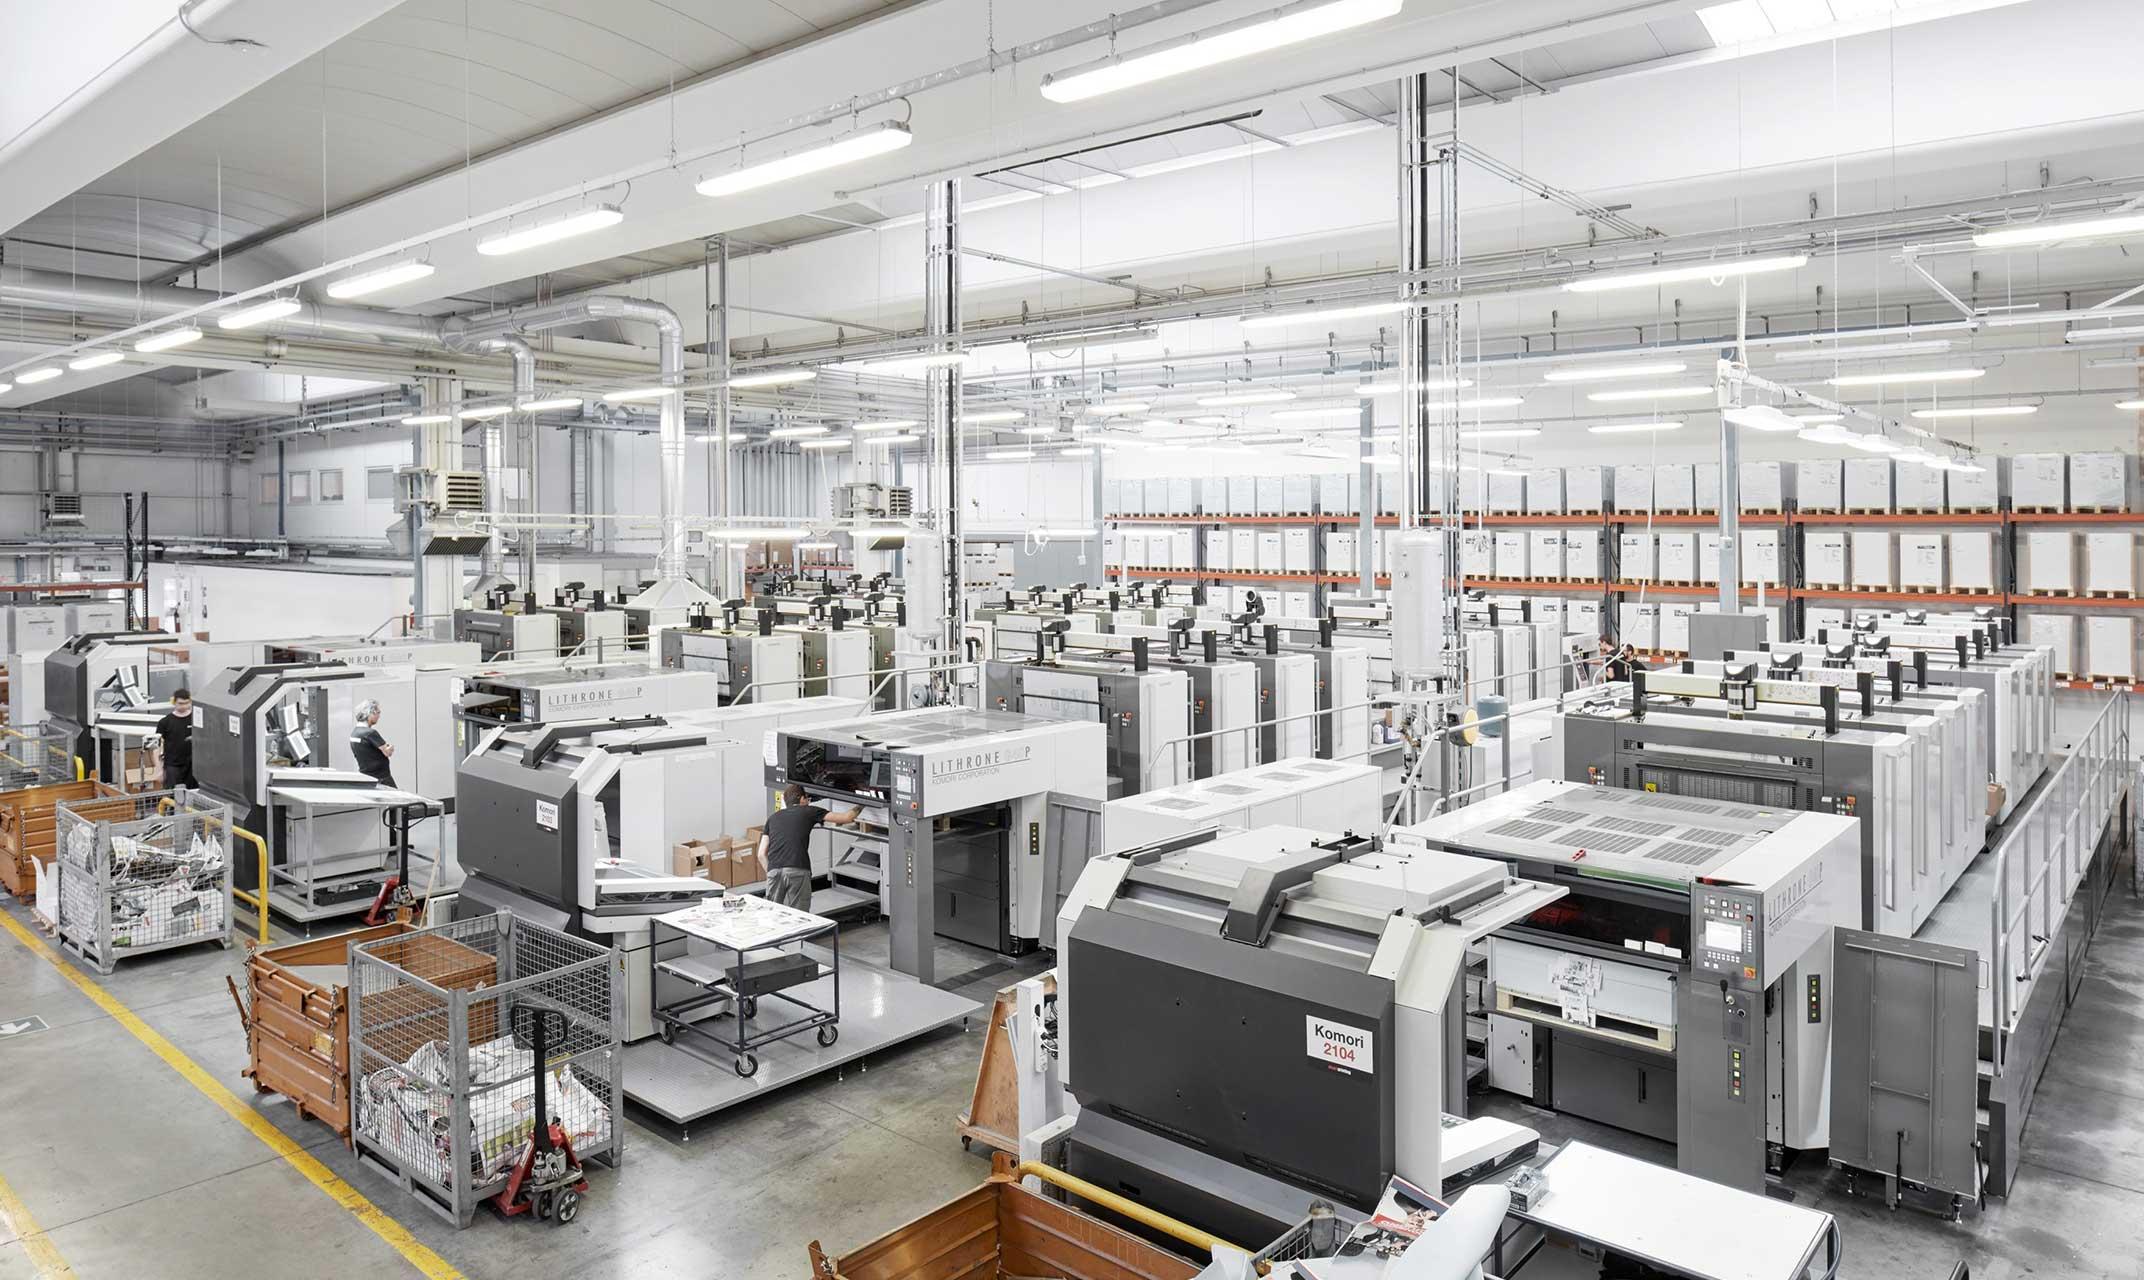 Fábrica de Pixartprinting